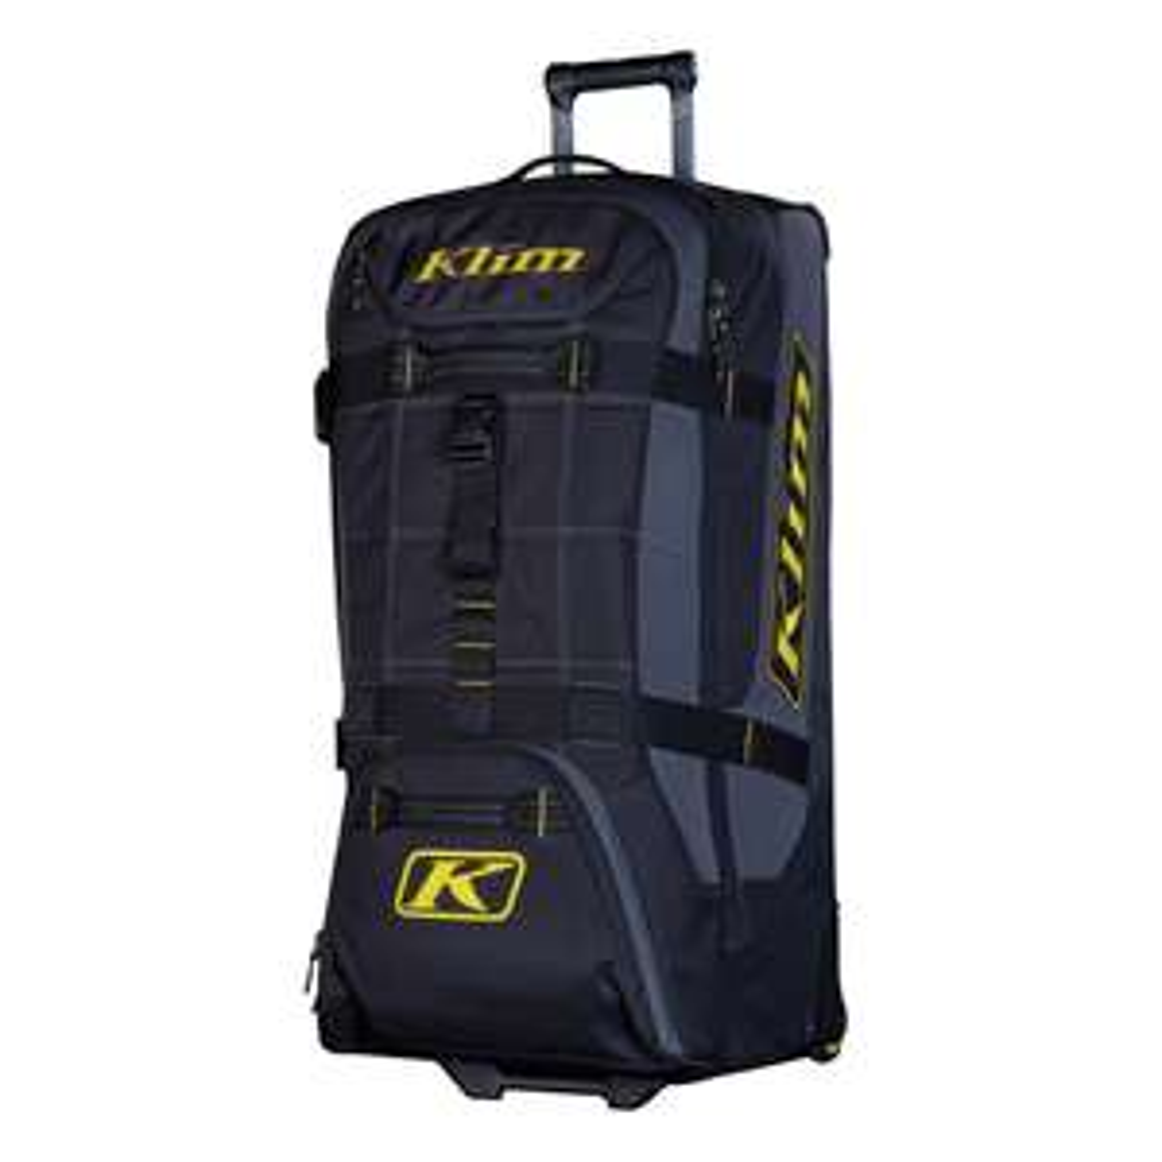 Sac de transport d'équipements de moto Klim Kodiak